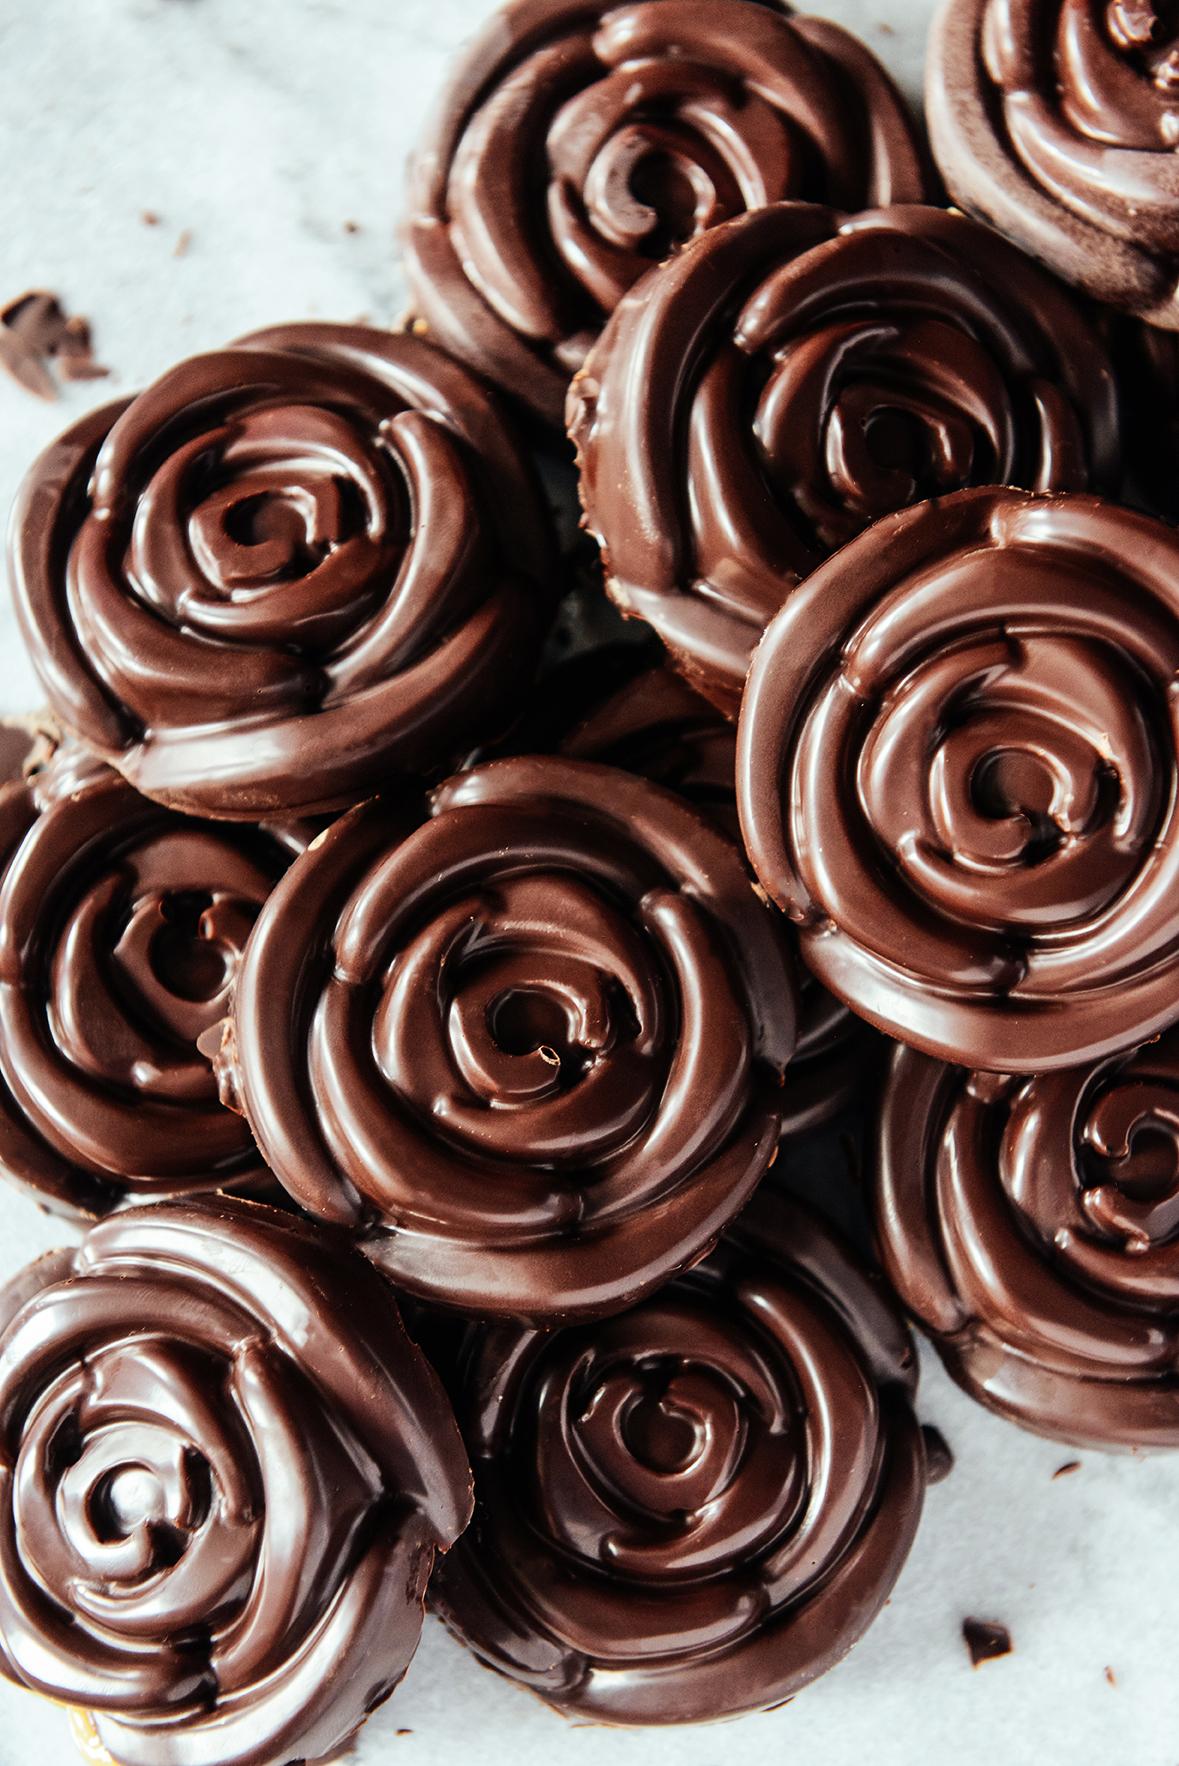 Chocolate Roses Because.... Schitt's Creek! // www.WithTheGrains.com